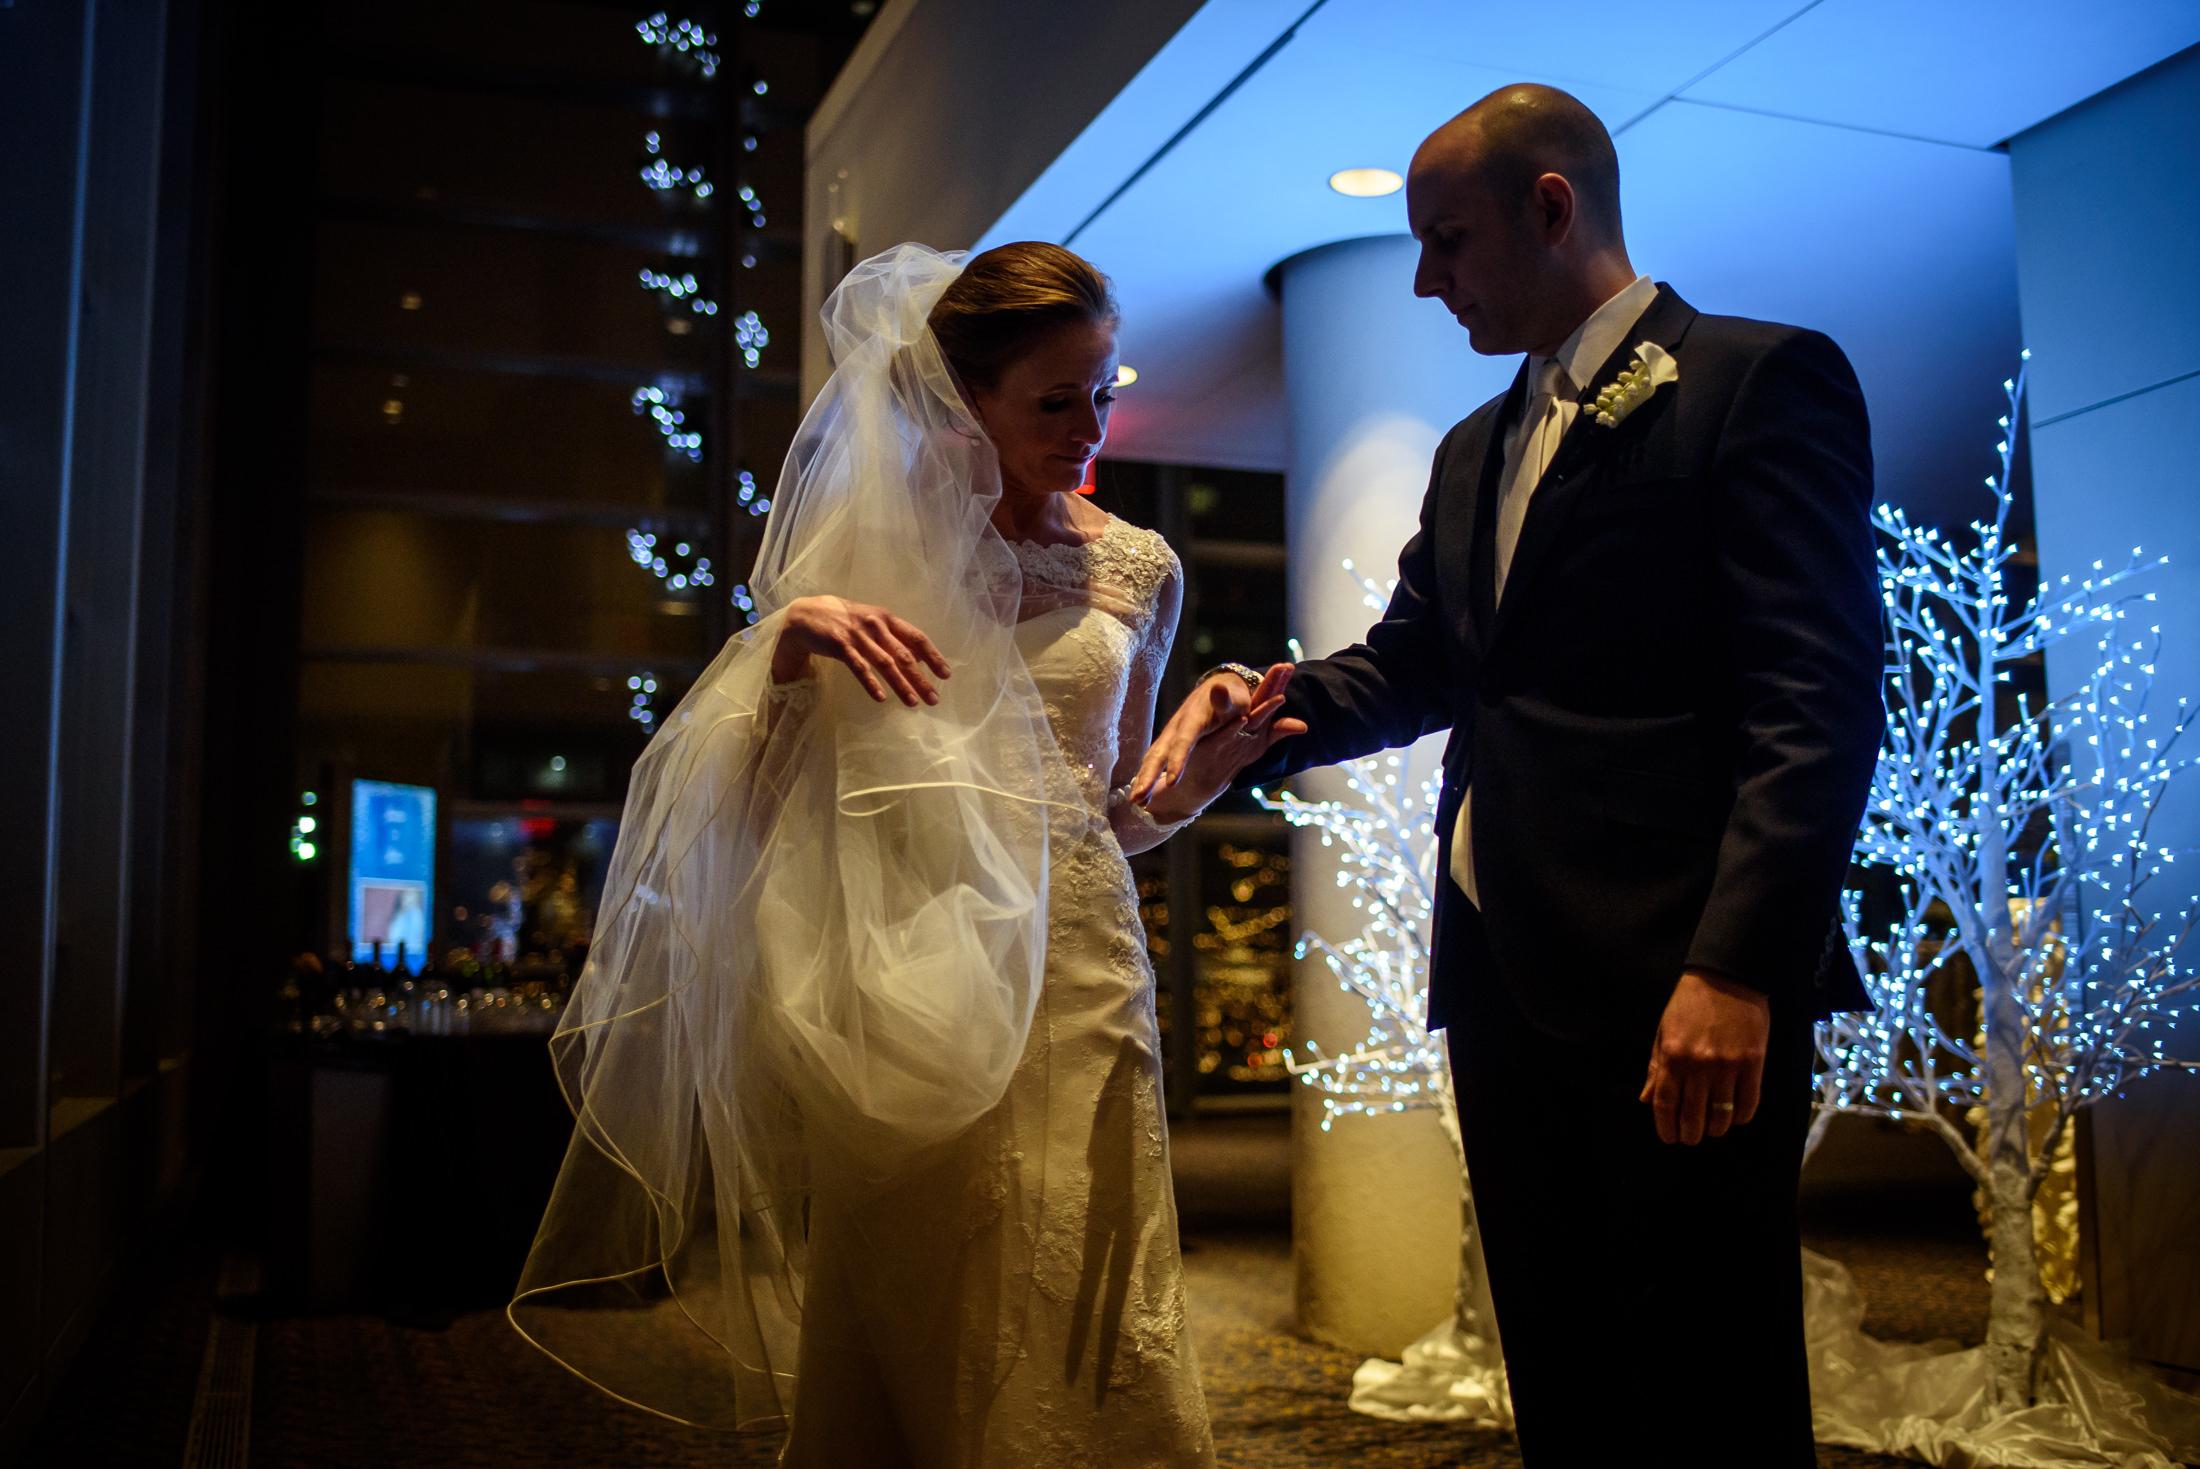 holland-center-reception-omaha-wedding-photographer-0006.JPG